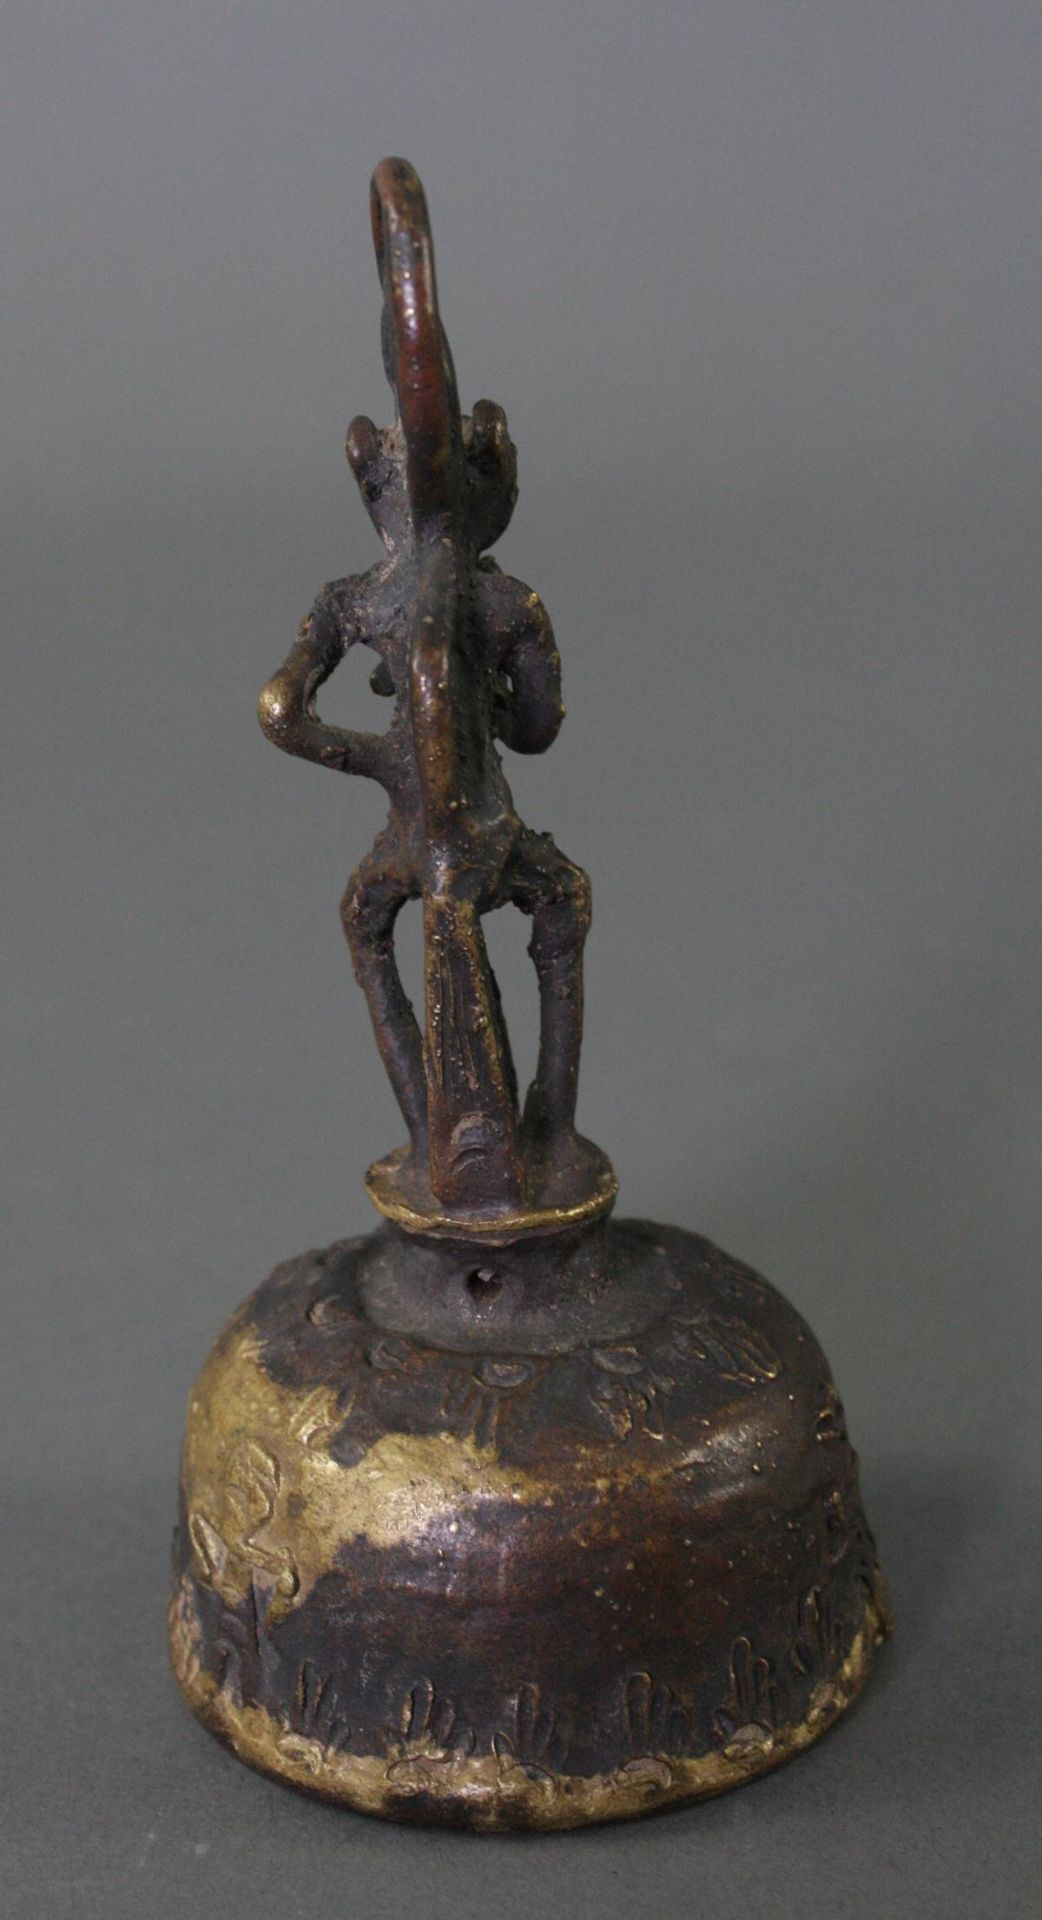 Hanuman-Glocke, Indien 19. Jahrhundert - Bild 3 aus 5